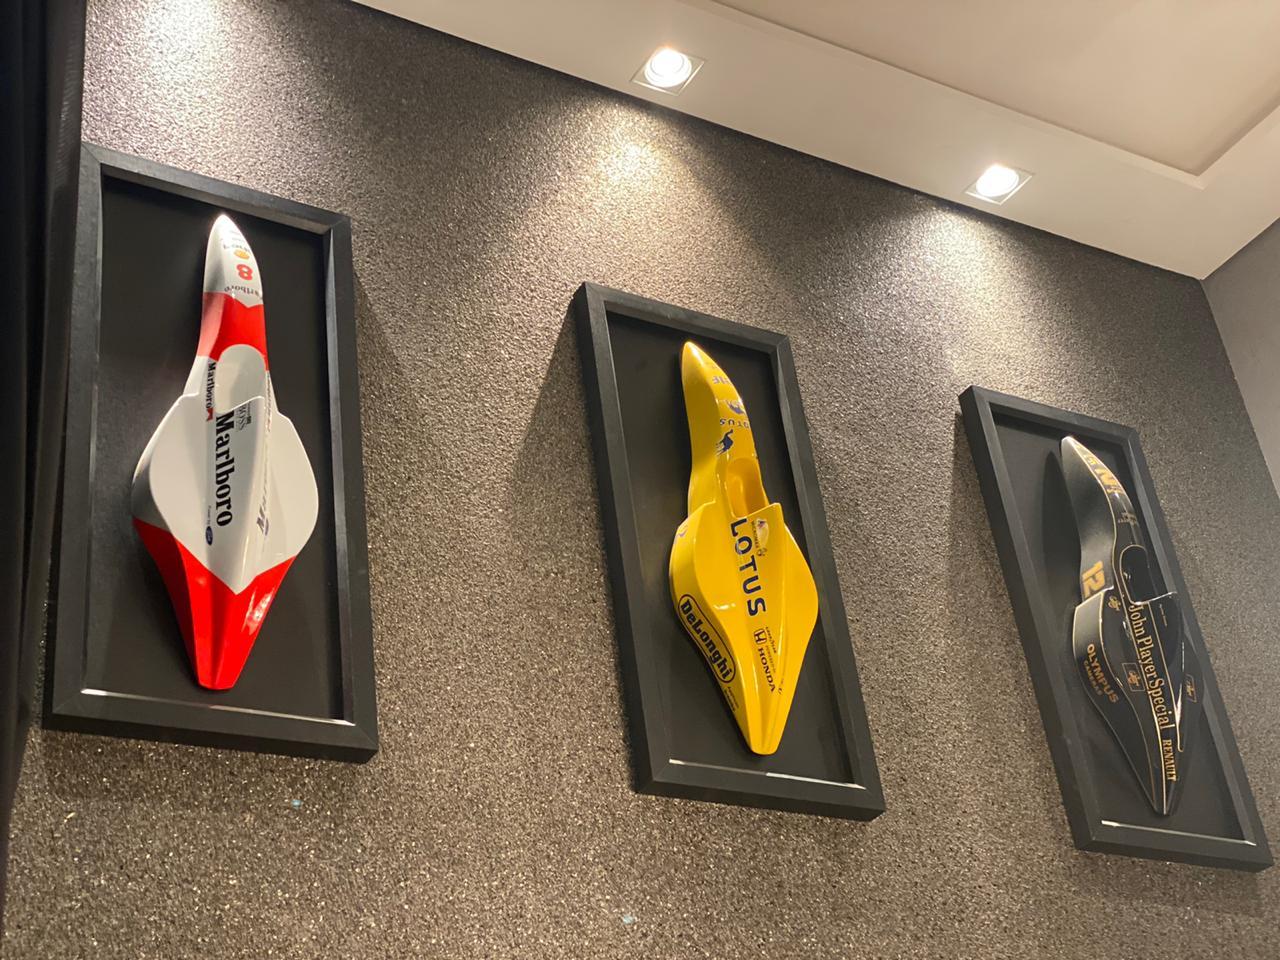 Kit Réplica Miniaturas F-1 (Moldura): McLaren Ford (Ayrton Senna) Team Lotus Renault (Ayrton Senna) Moldura: Lotus (Honda) - CG - EV